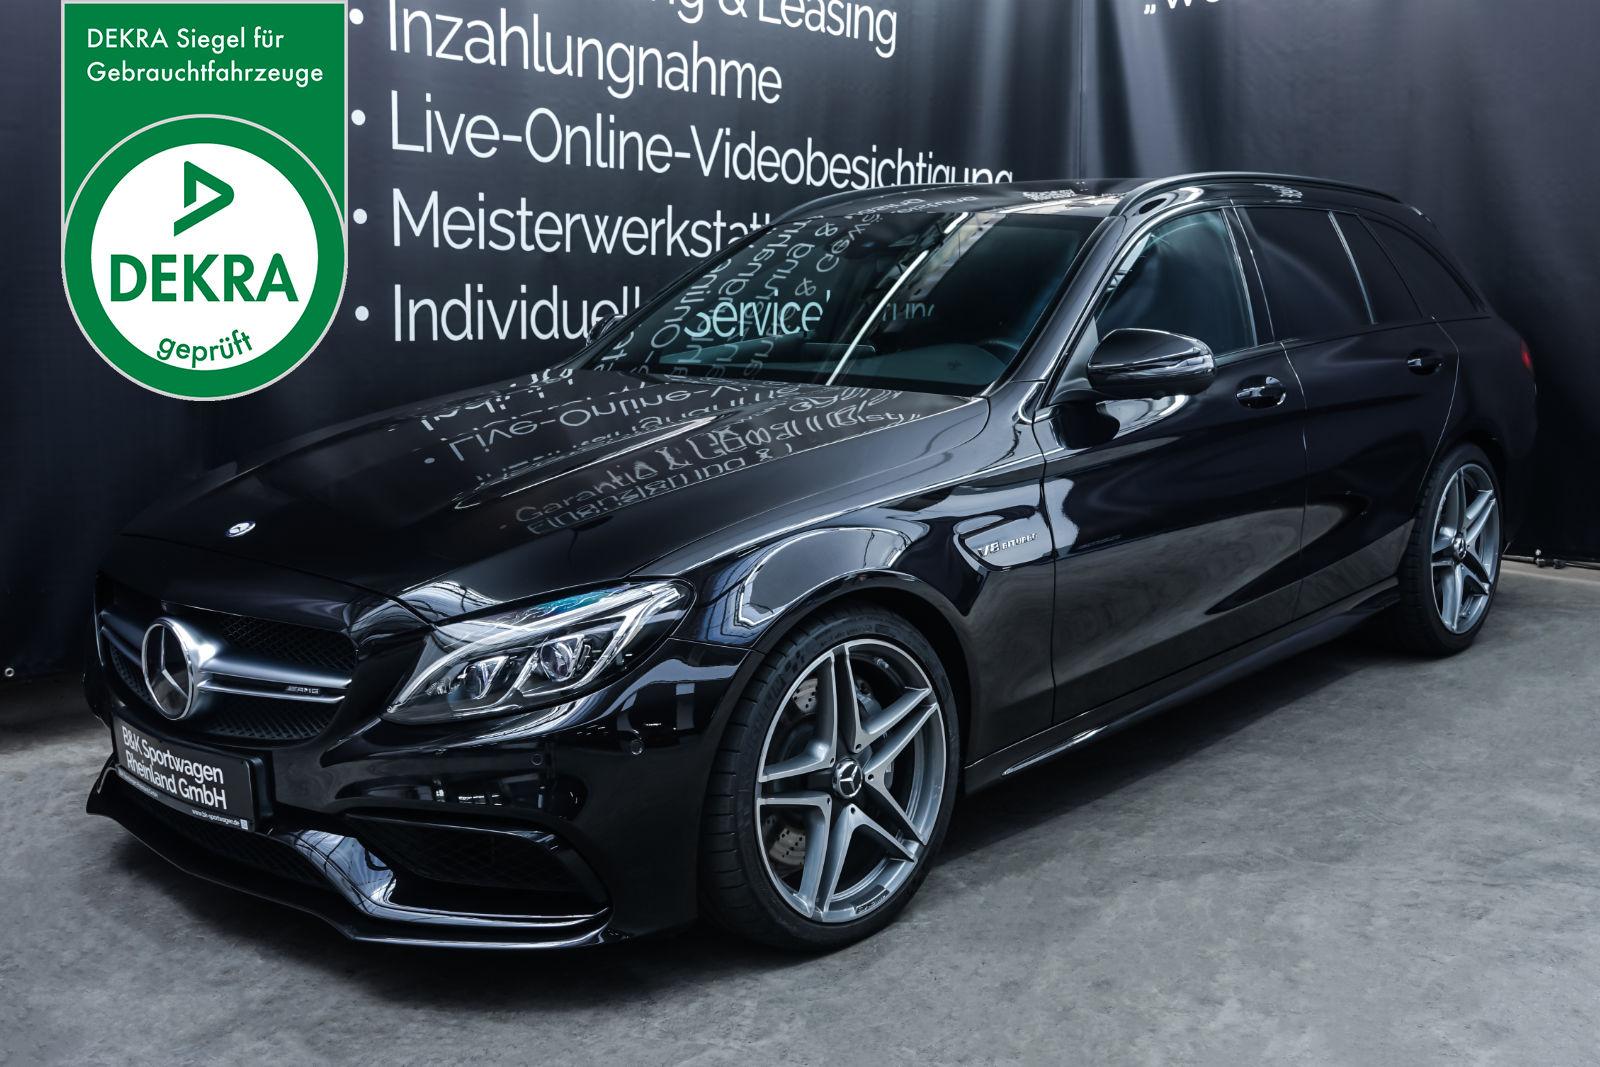 MercedesBenz_C63AMG_TModell_Schwarz_Schwarz_MB-9387_Plakette_w